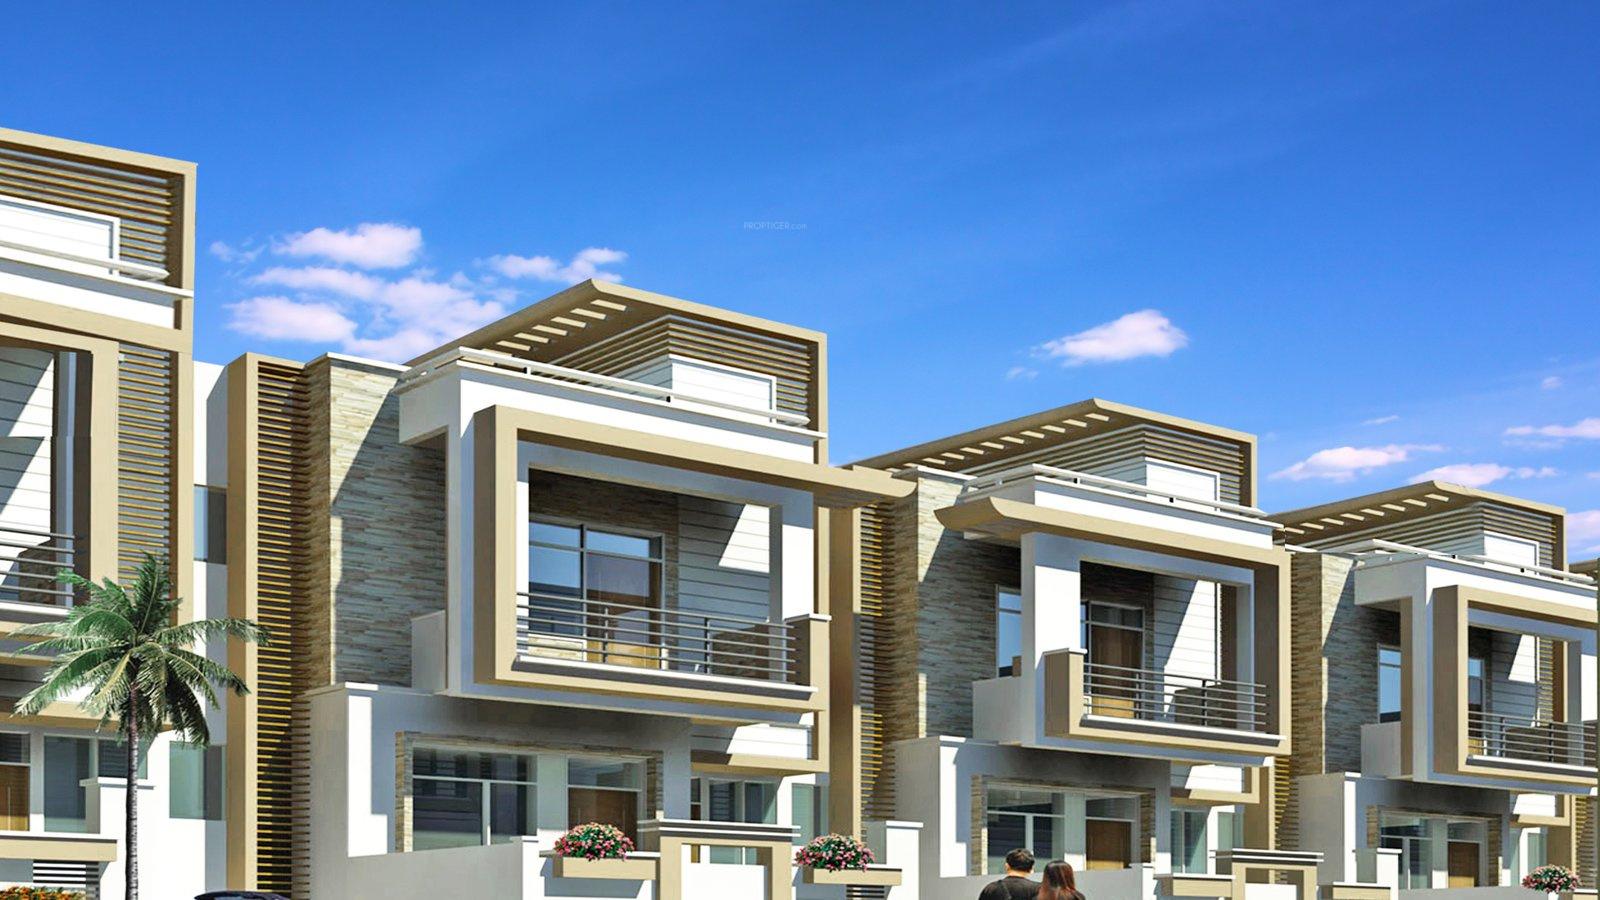 Main elevation image 3 of pearl spytech d villa unit for Villa elevation photos